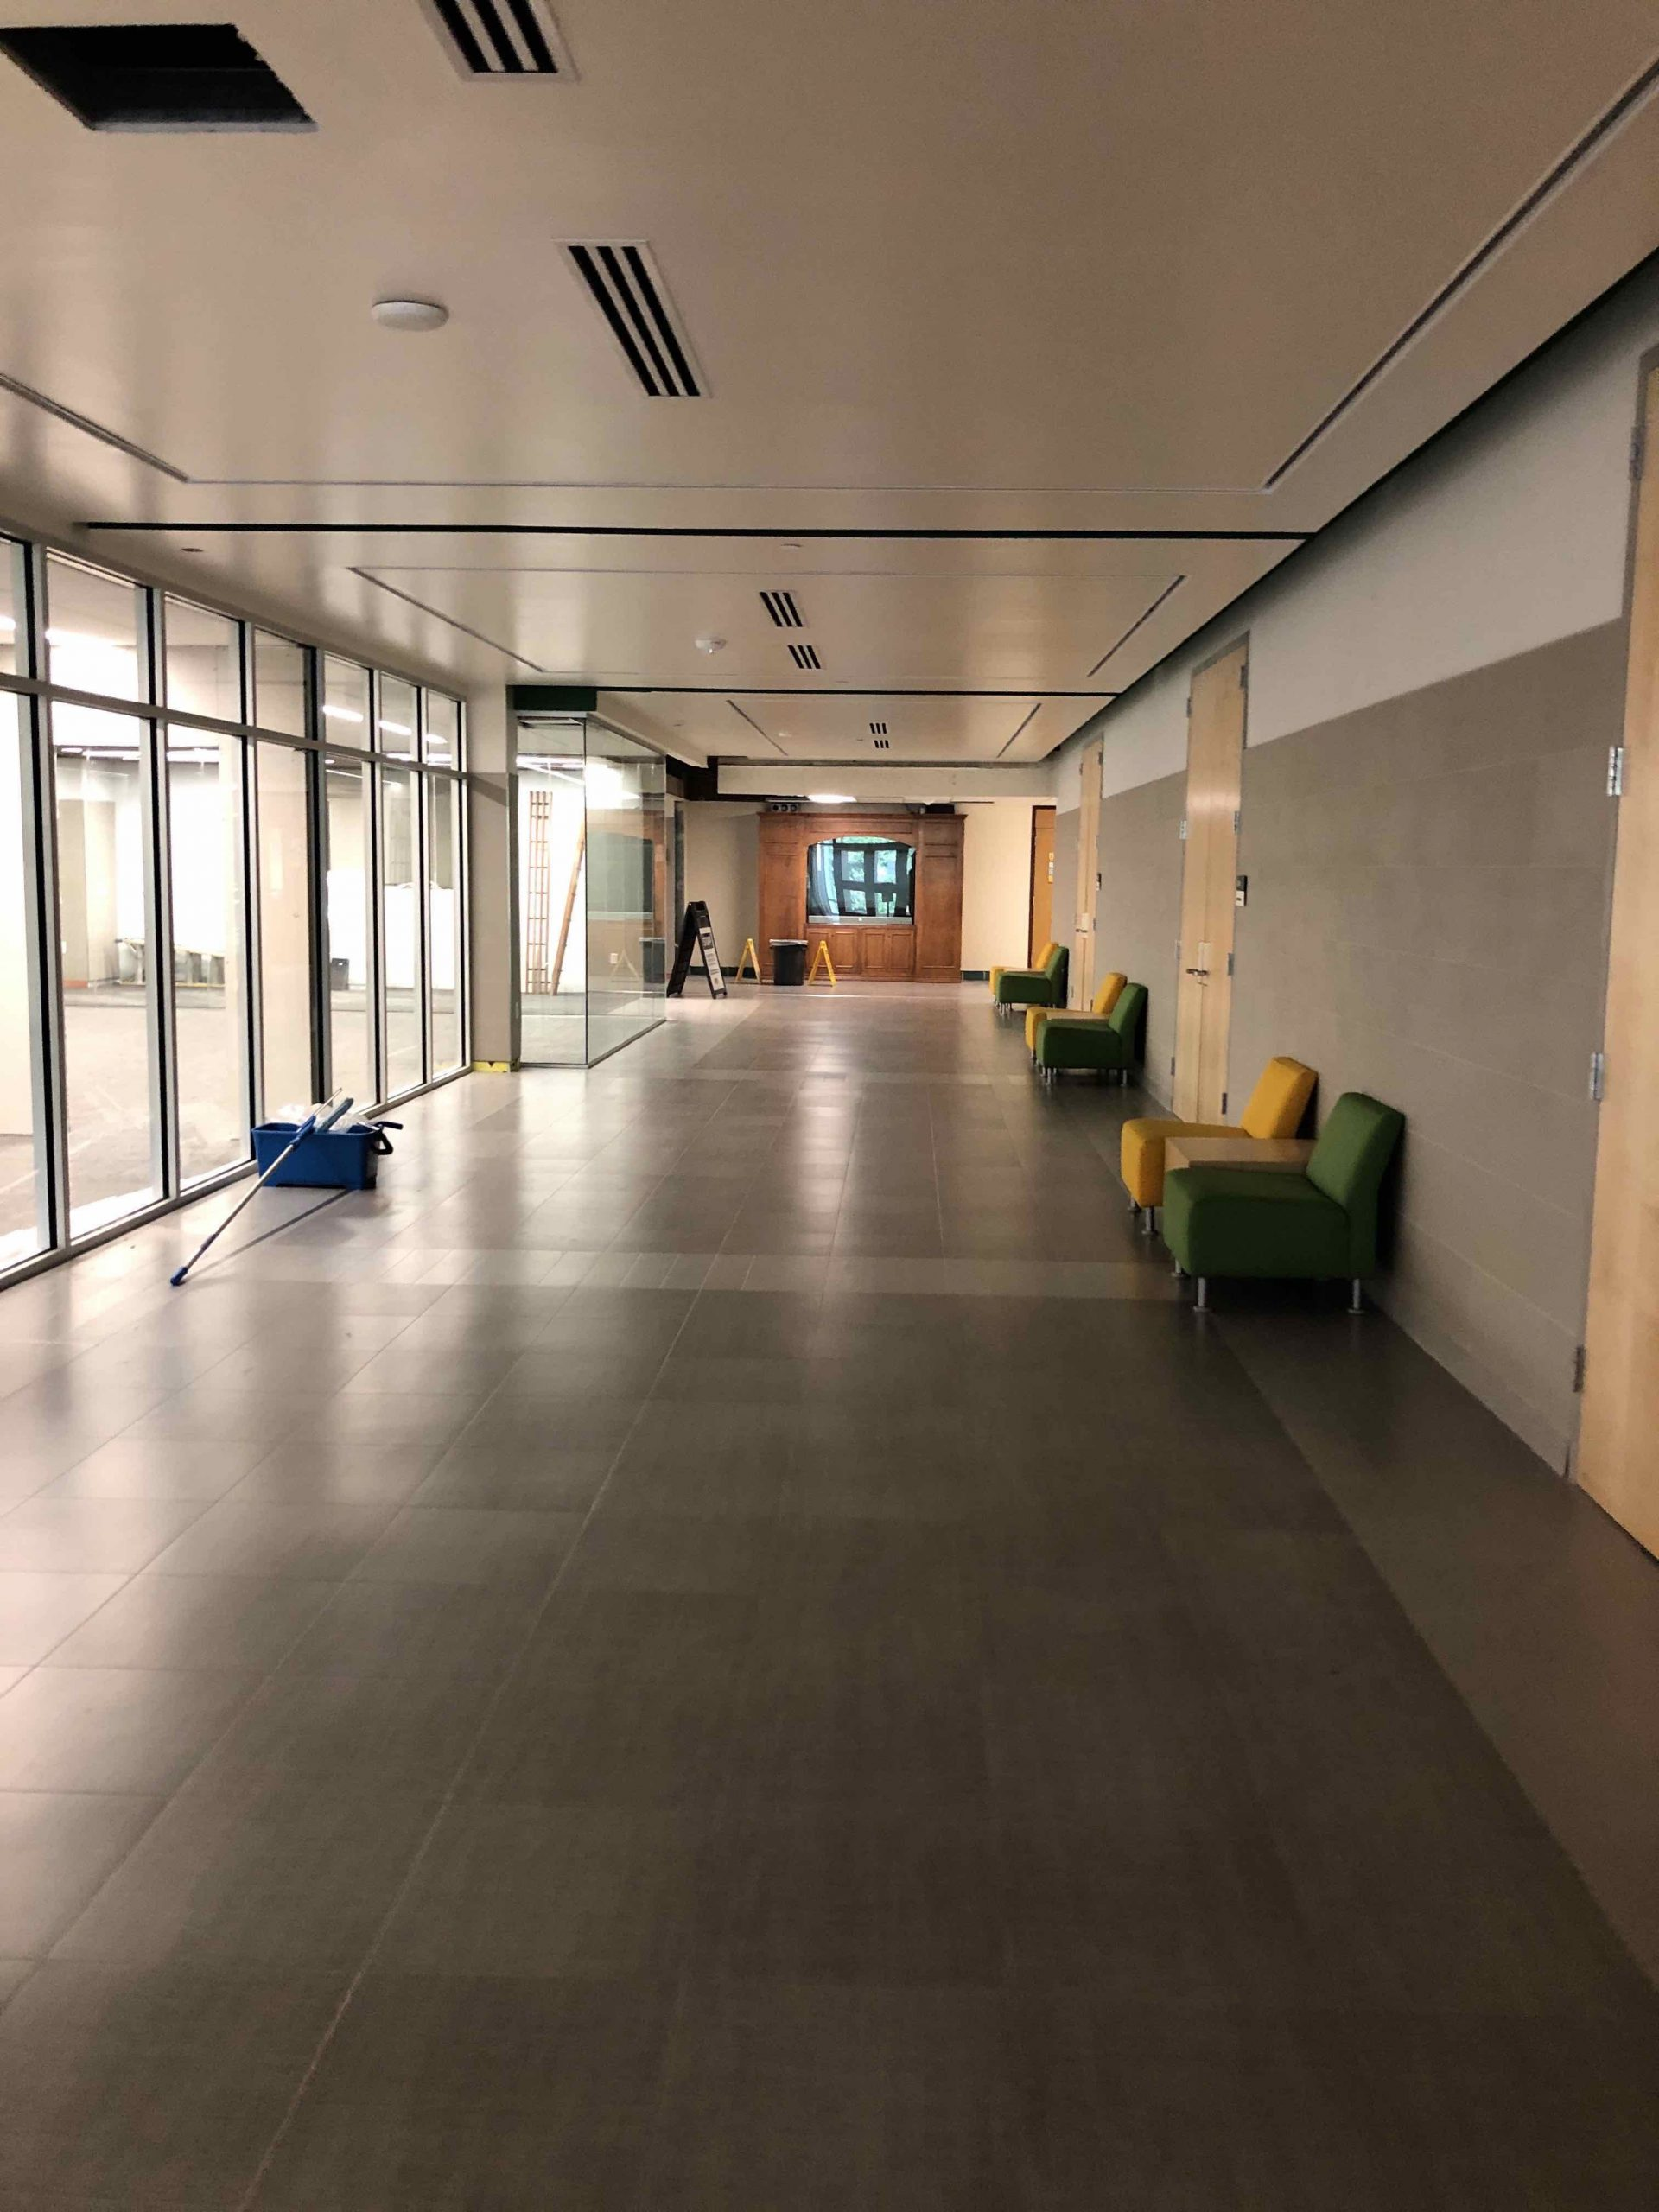 Main Hallway & Media Center image 0